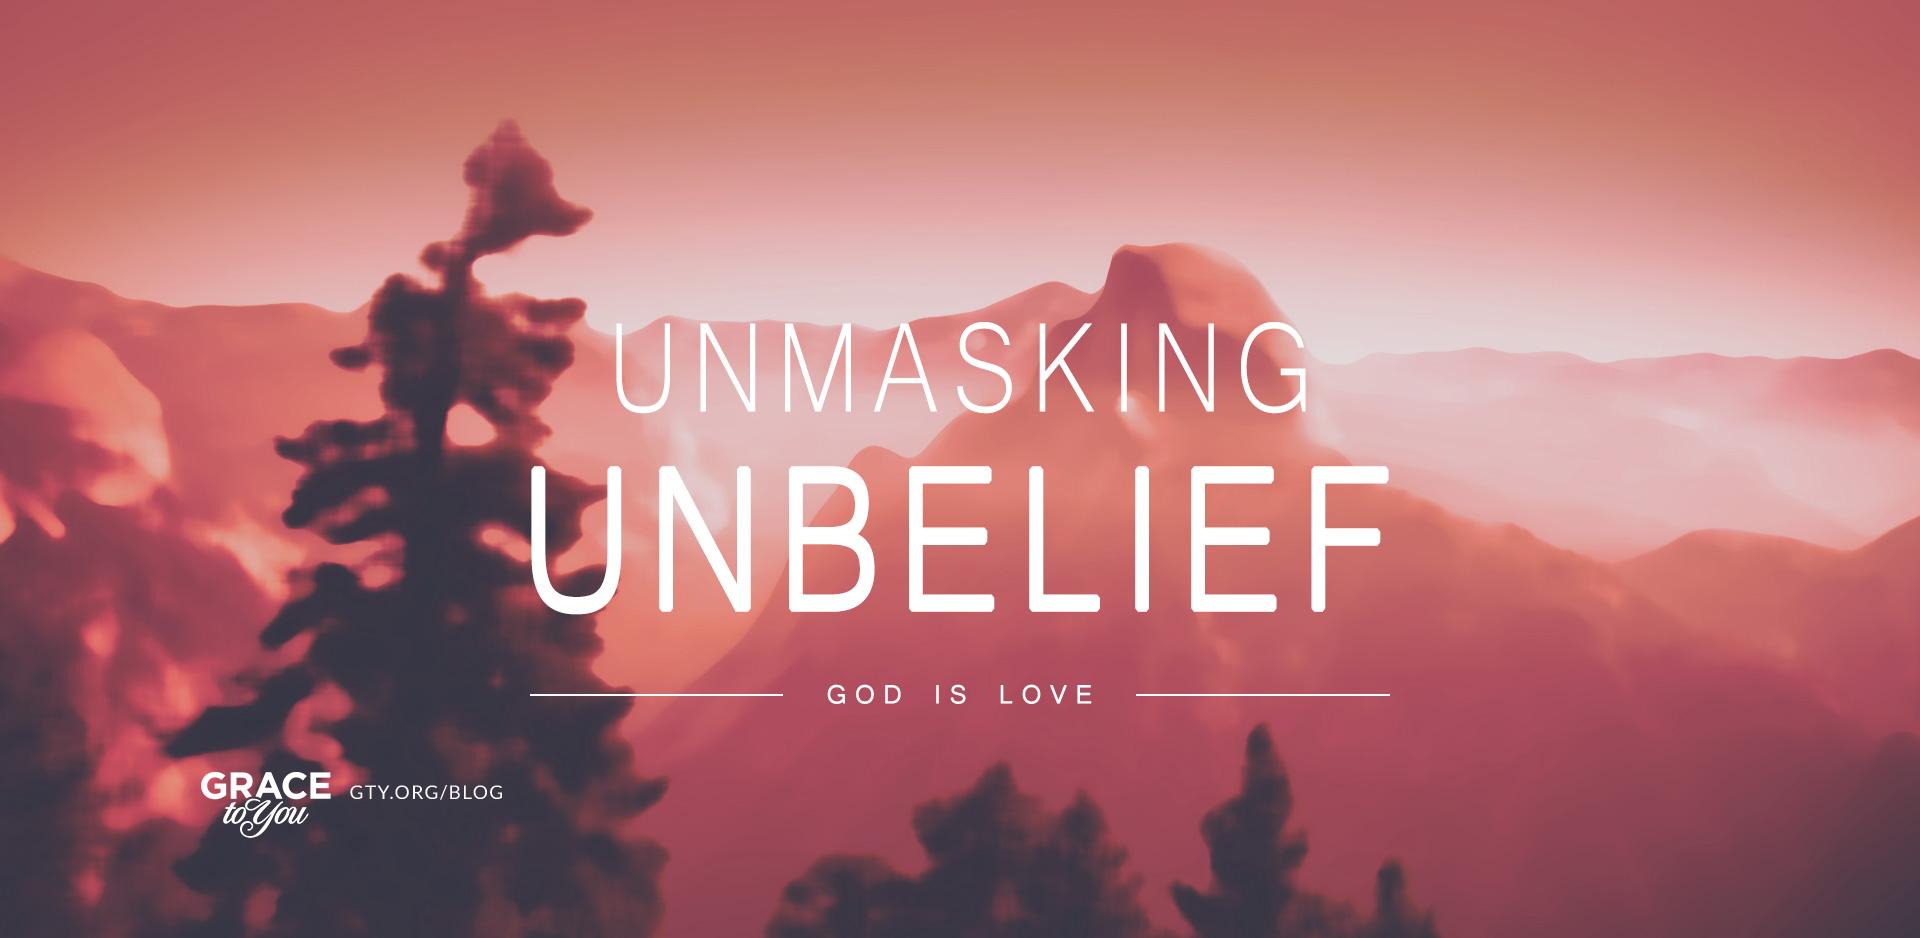 Unmasking Unbelief